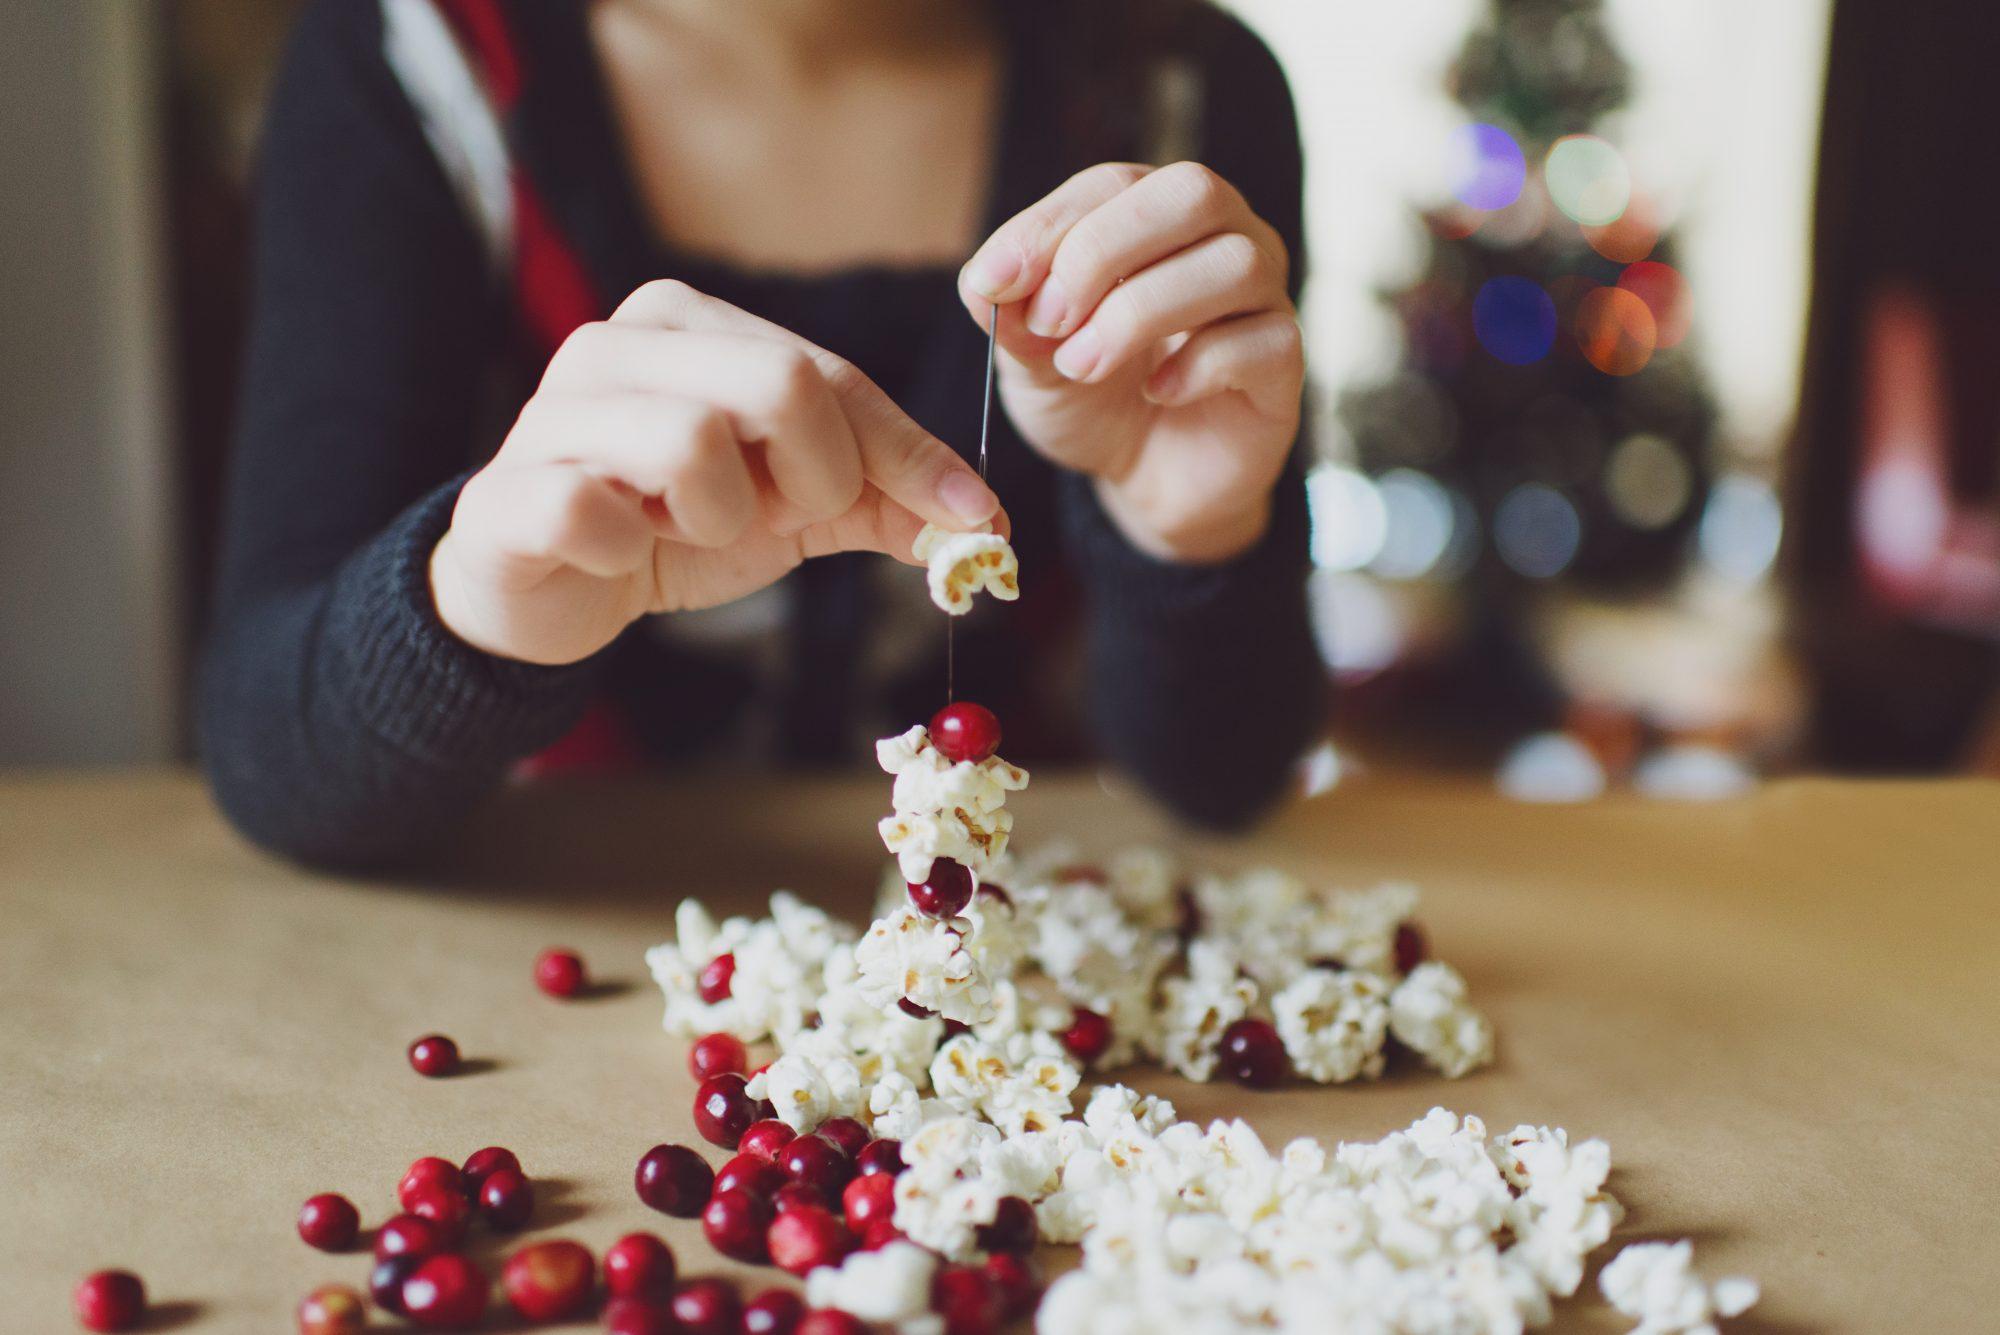 Making Christmas garland of fresh cranberries and popcorn.